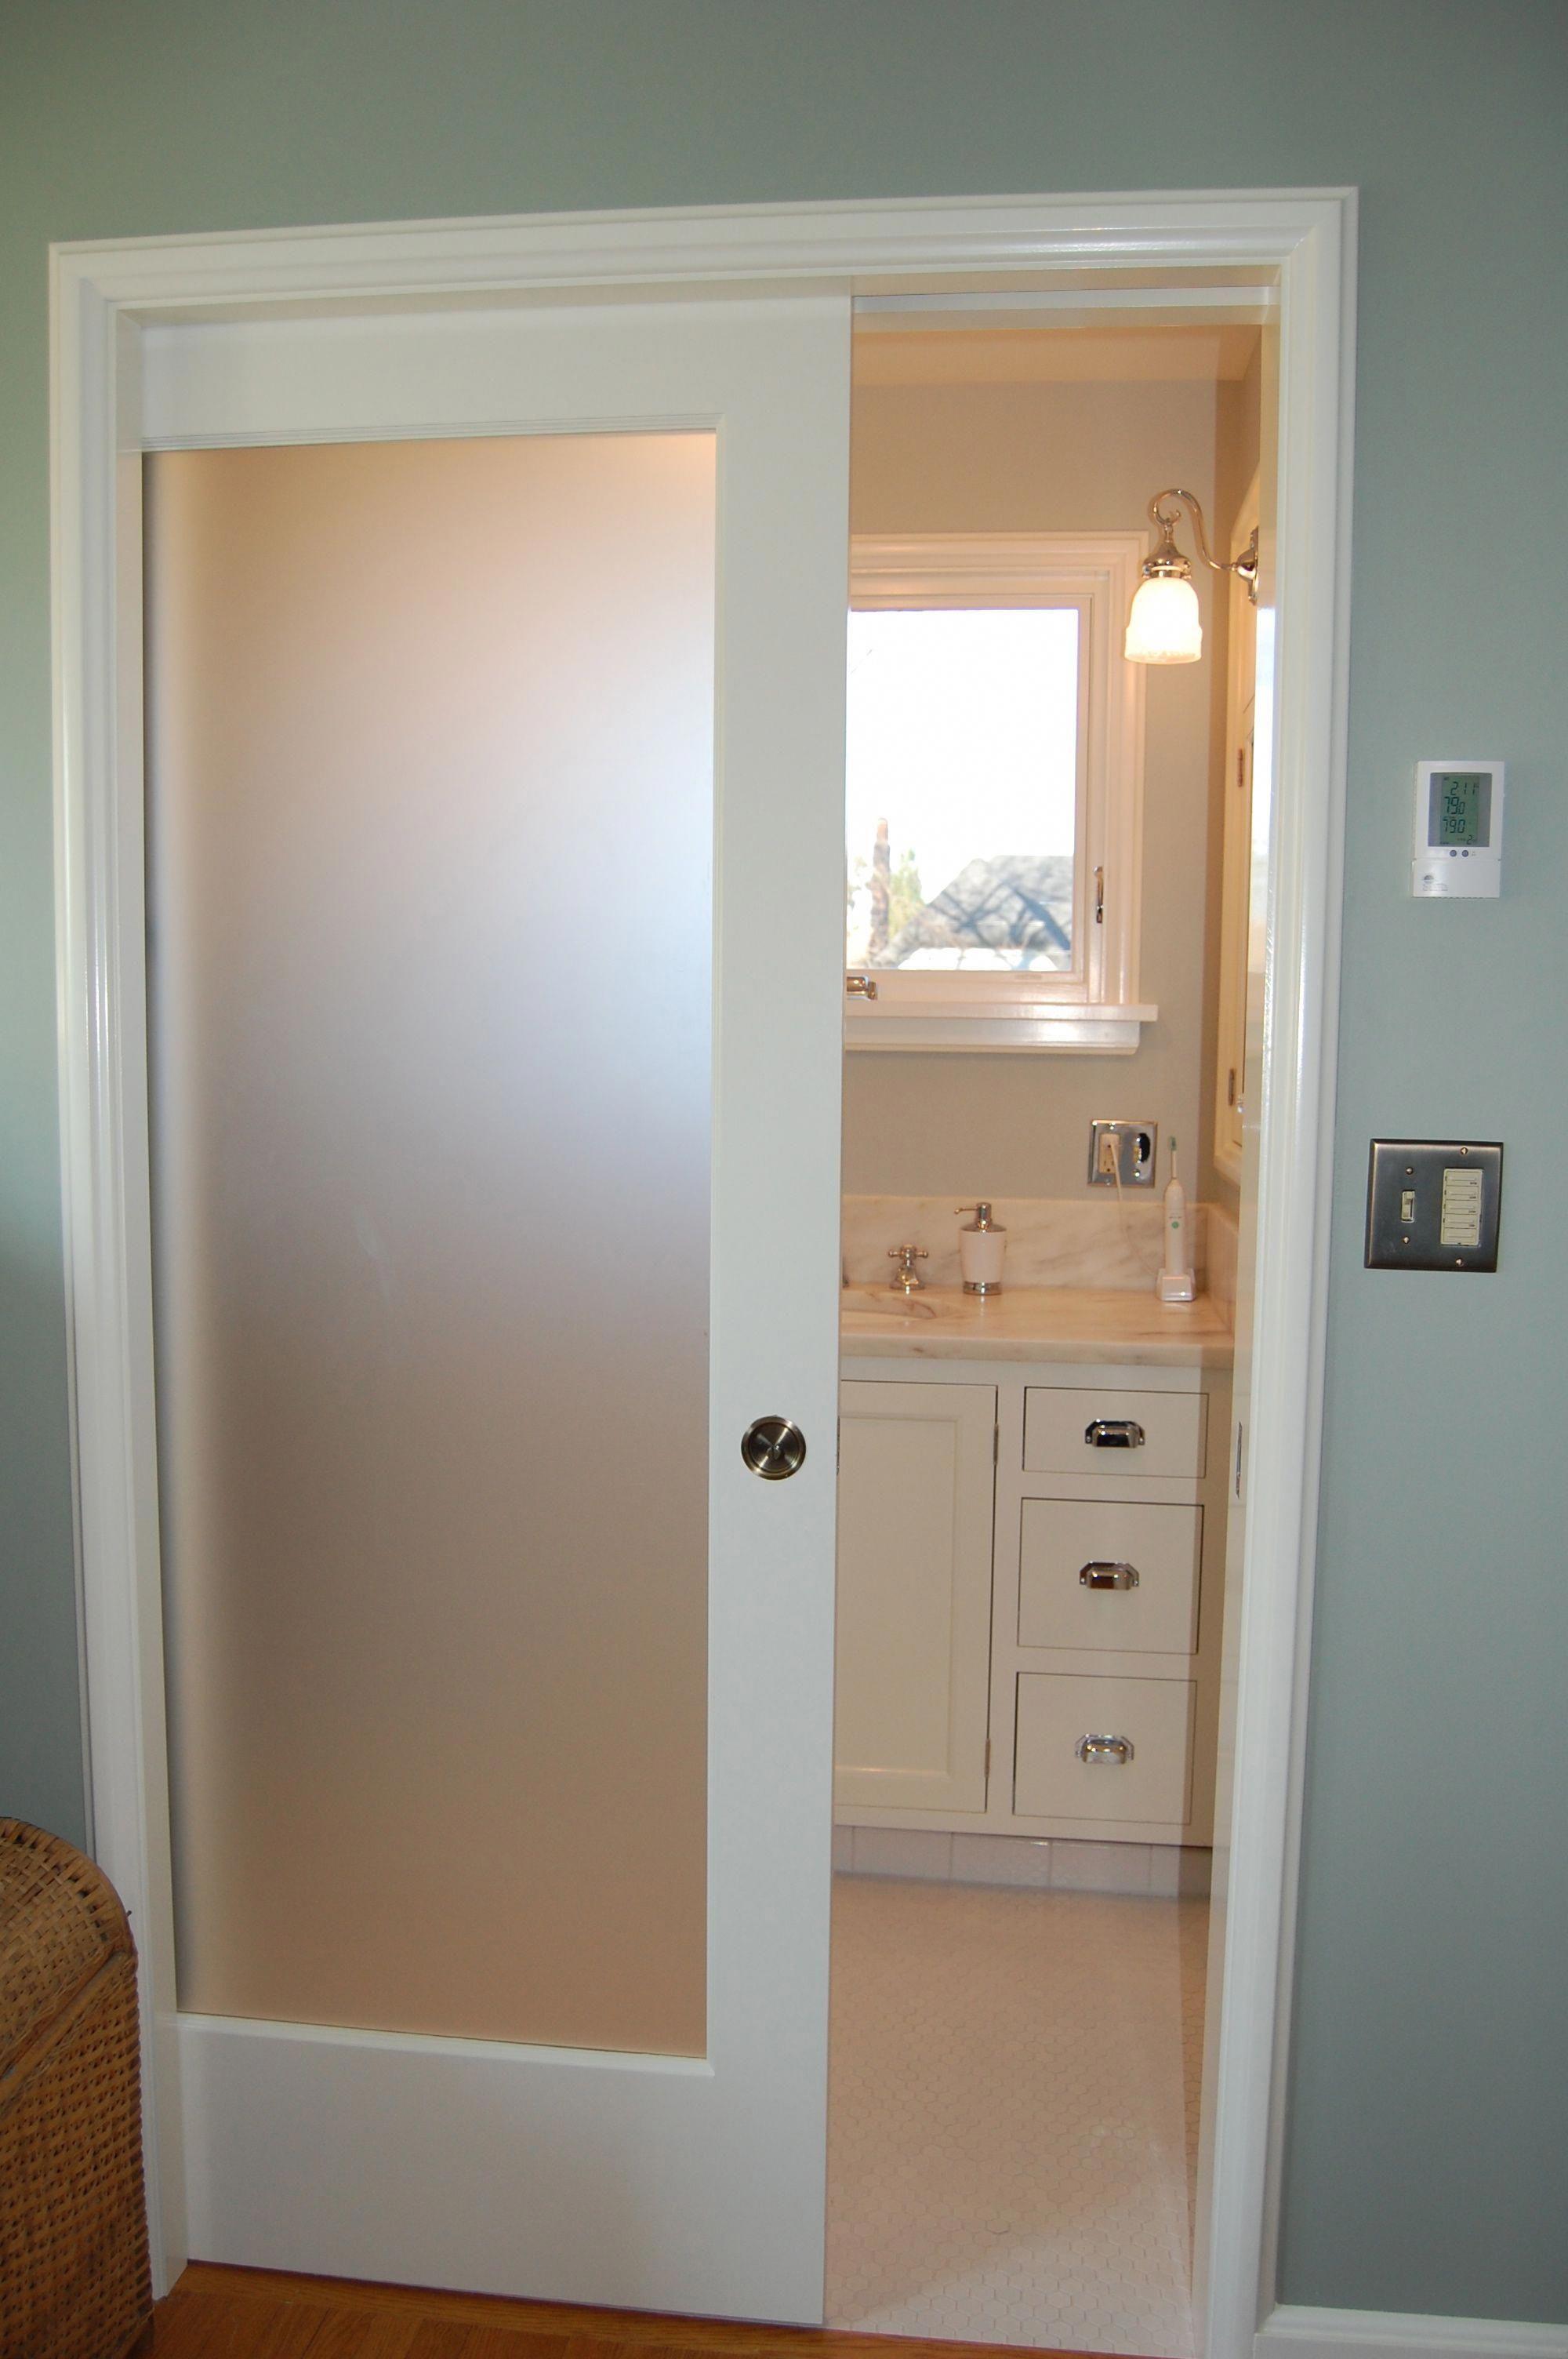 Internal Sliding Doors Room Dividers Interior Sliding Glass Doors Residential Opaque Glass Sli Interior Pocket Doors Glass Pocket Doors Sliding Door Design